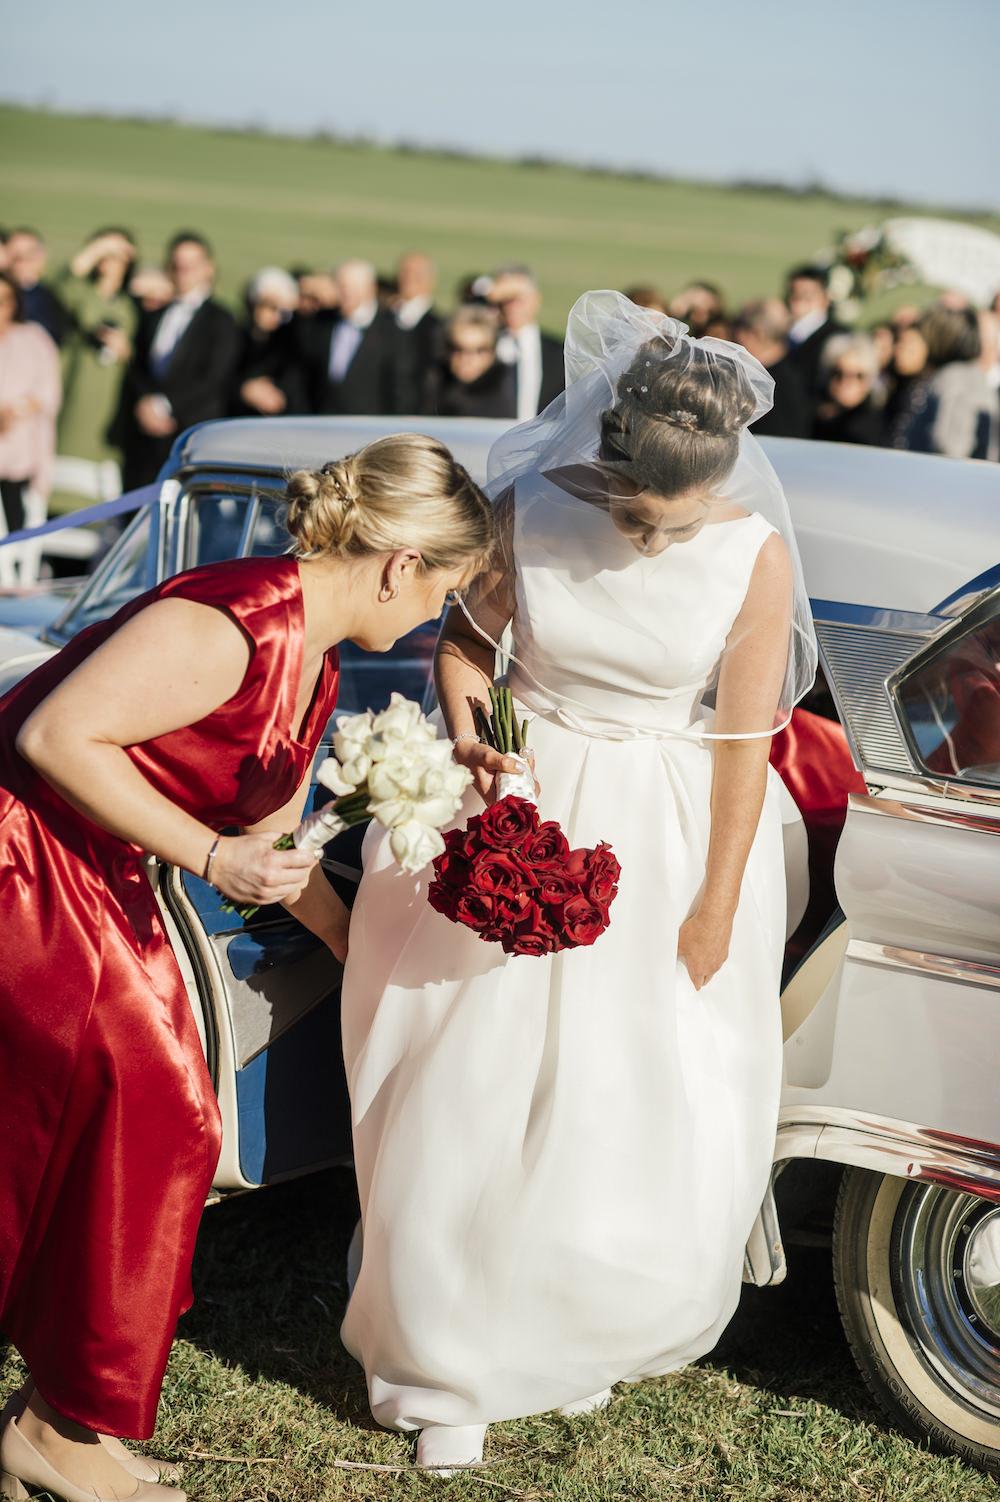 lindahamish-wedding-203.JPG